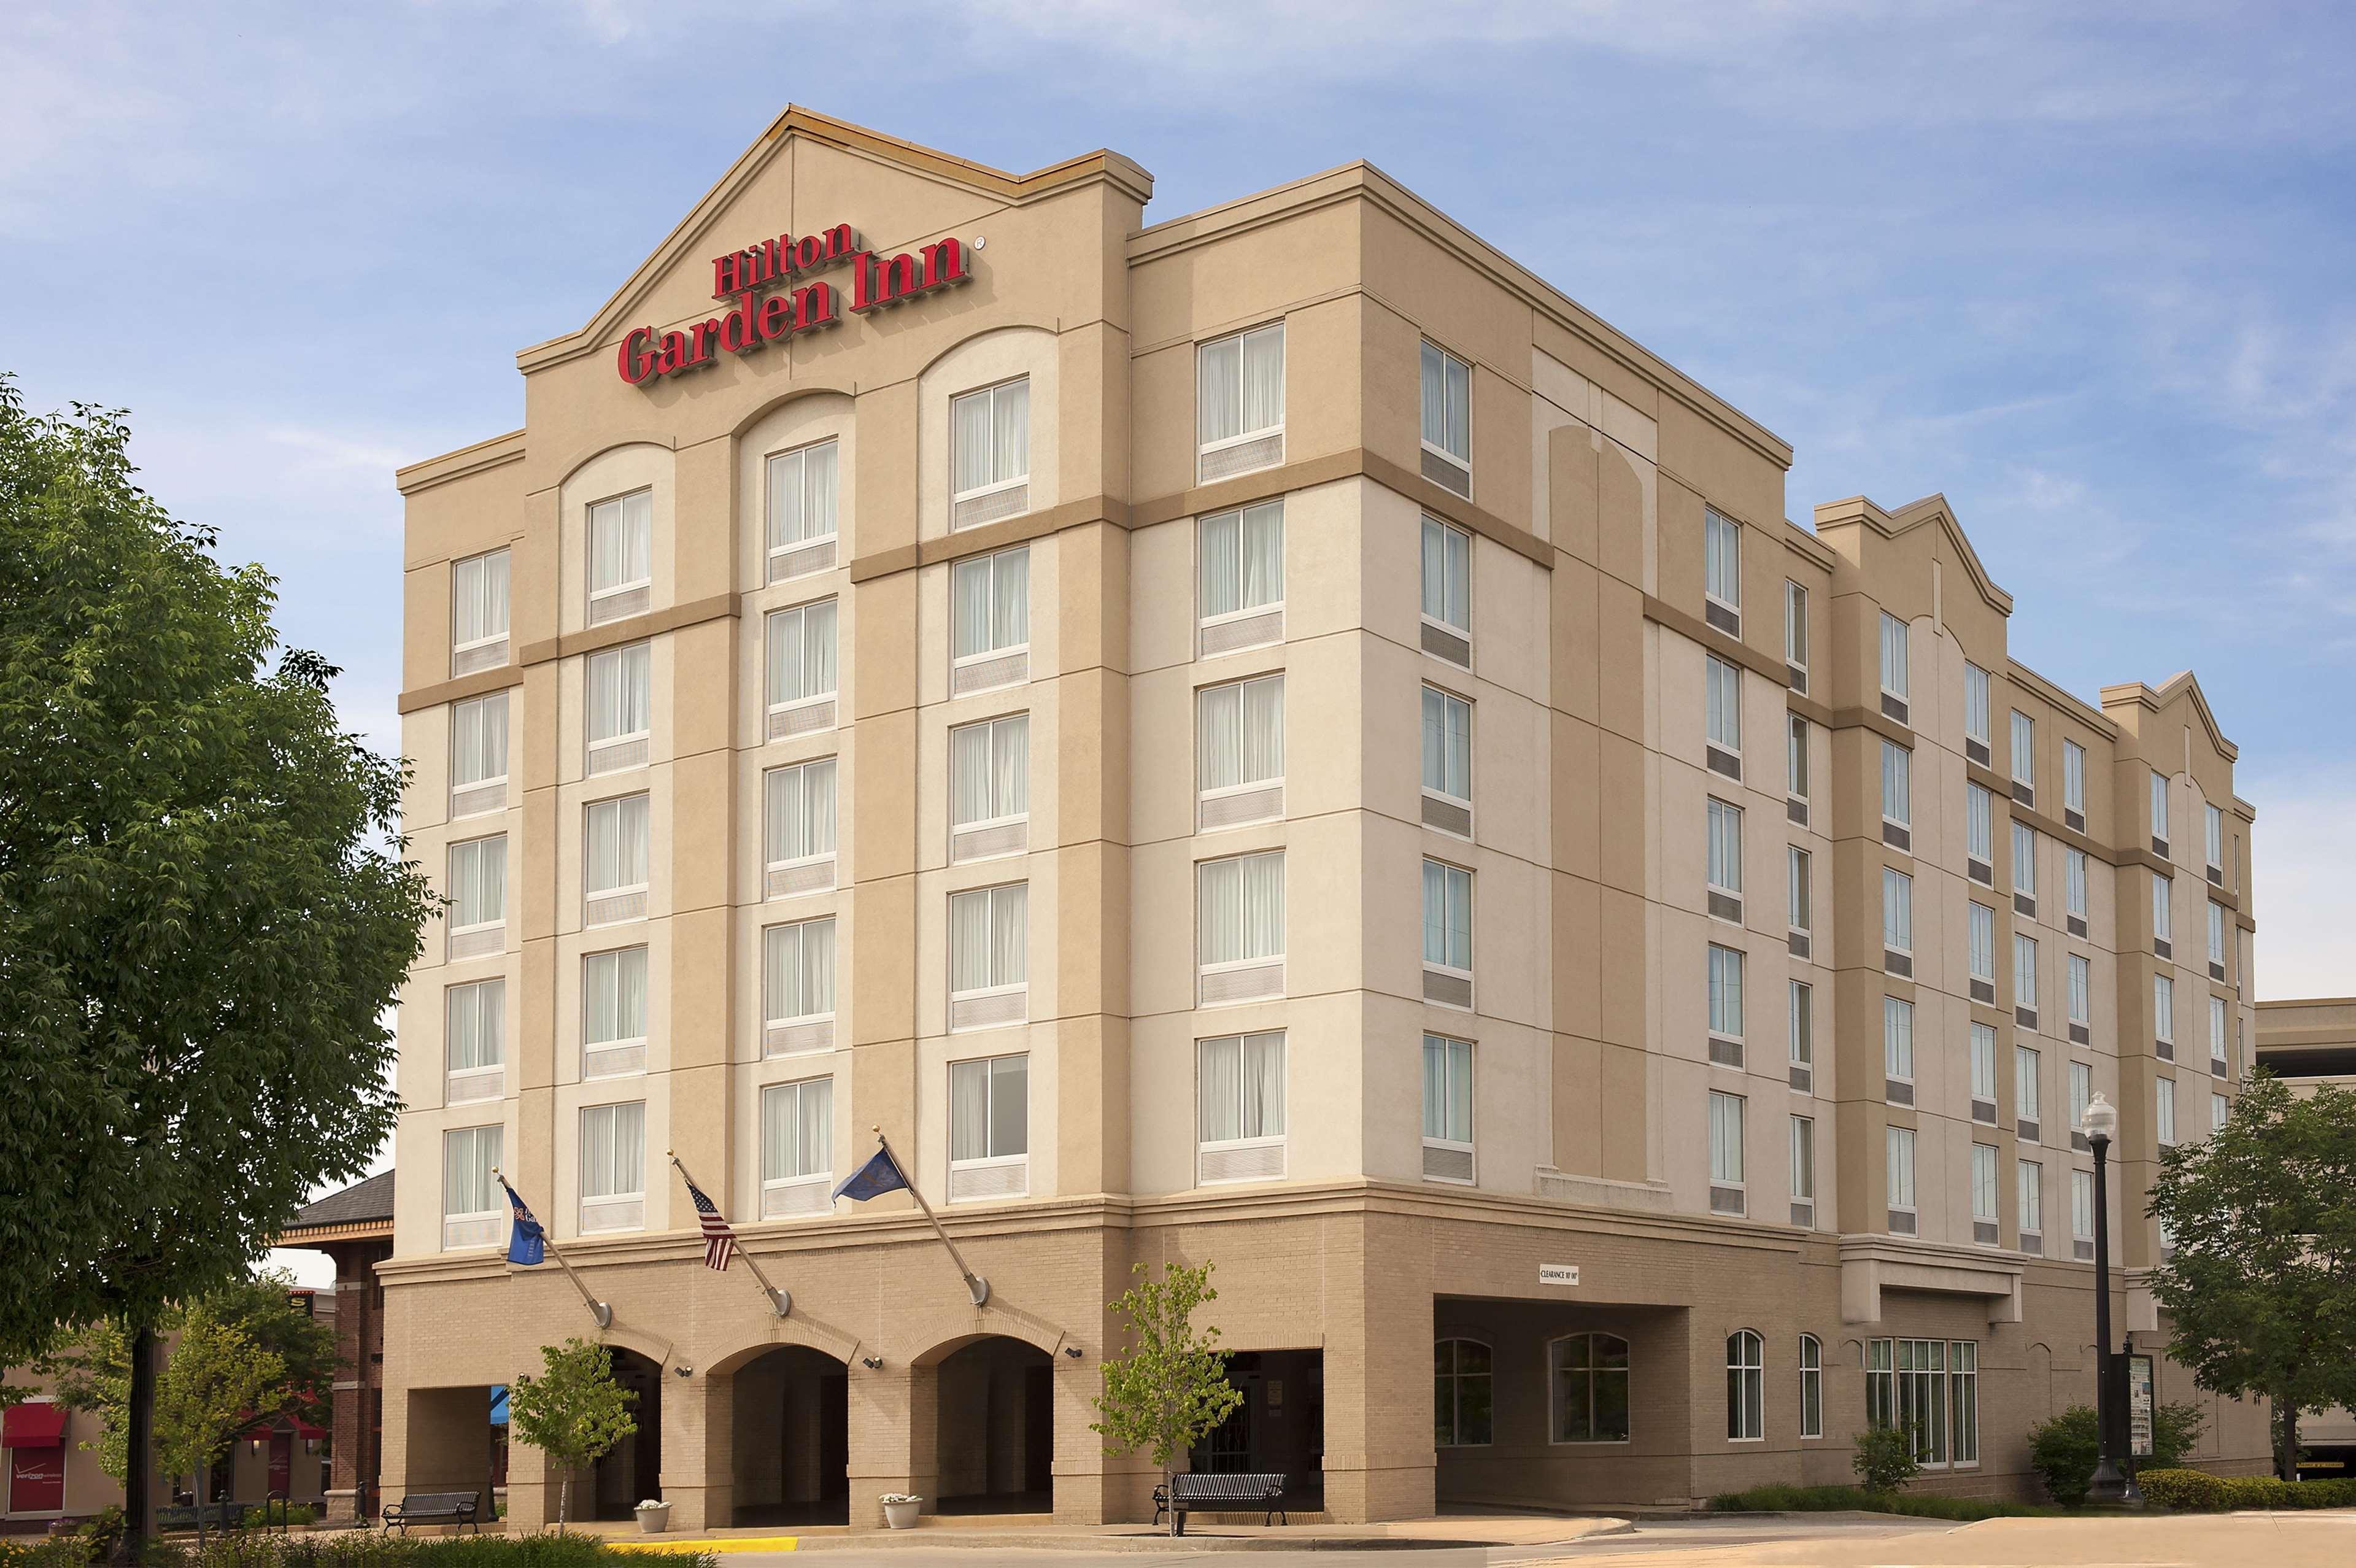 Hilton Garden Inn West Lafayette Wabash Landing image 1